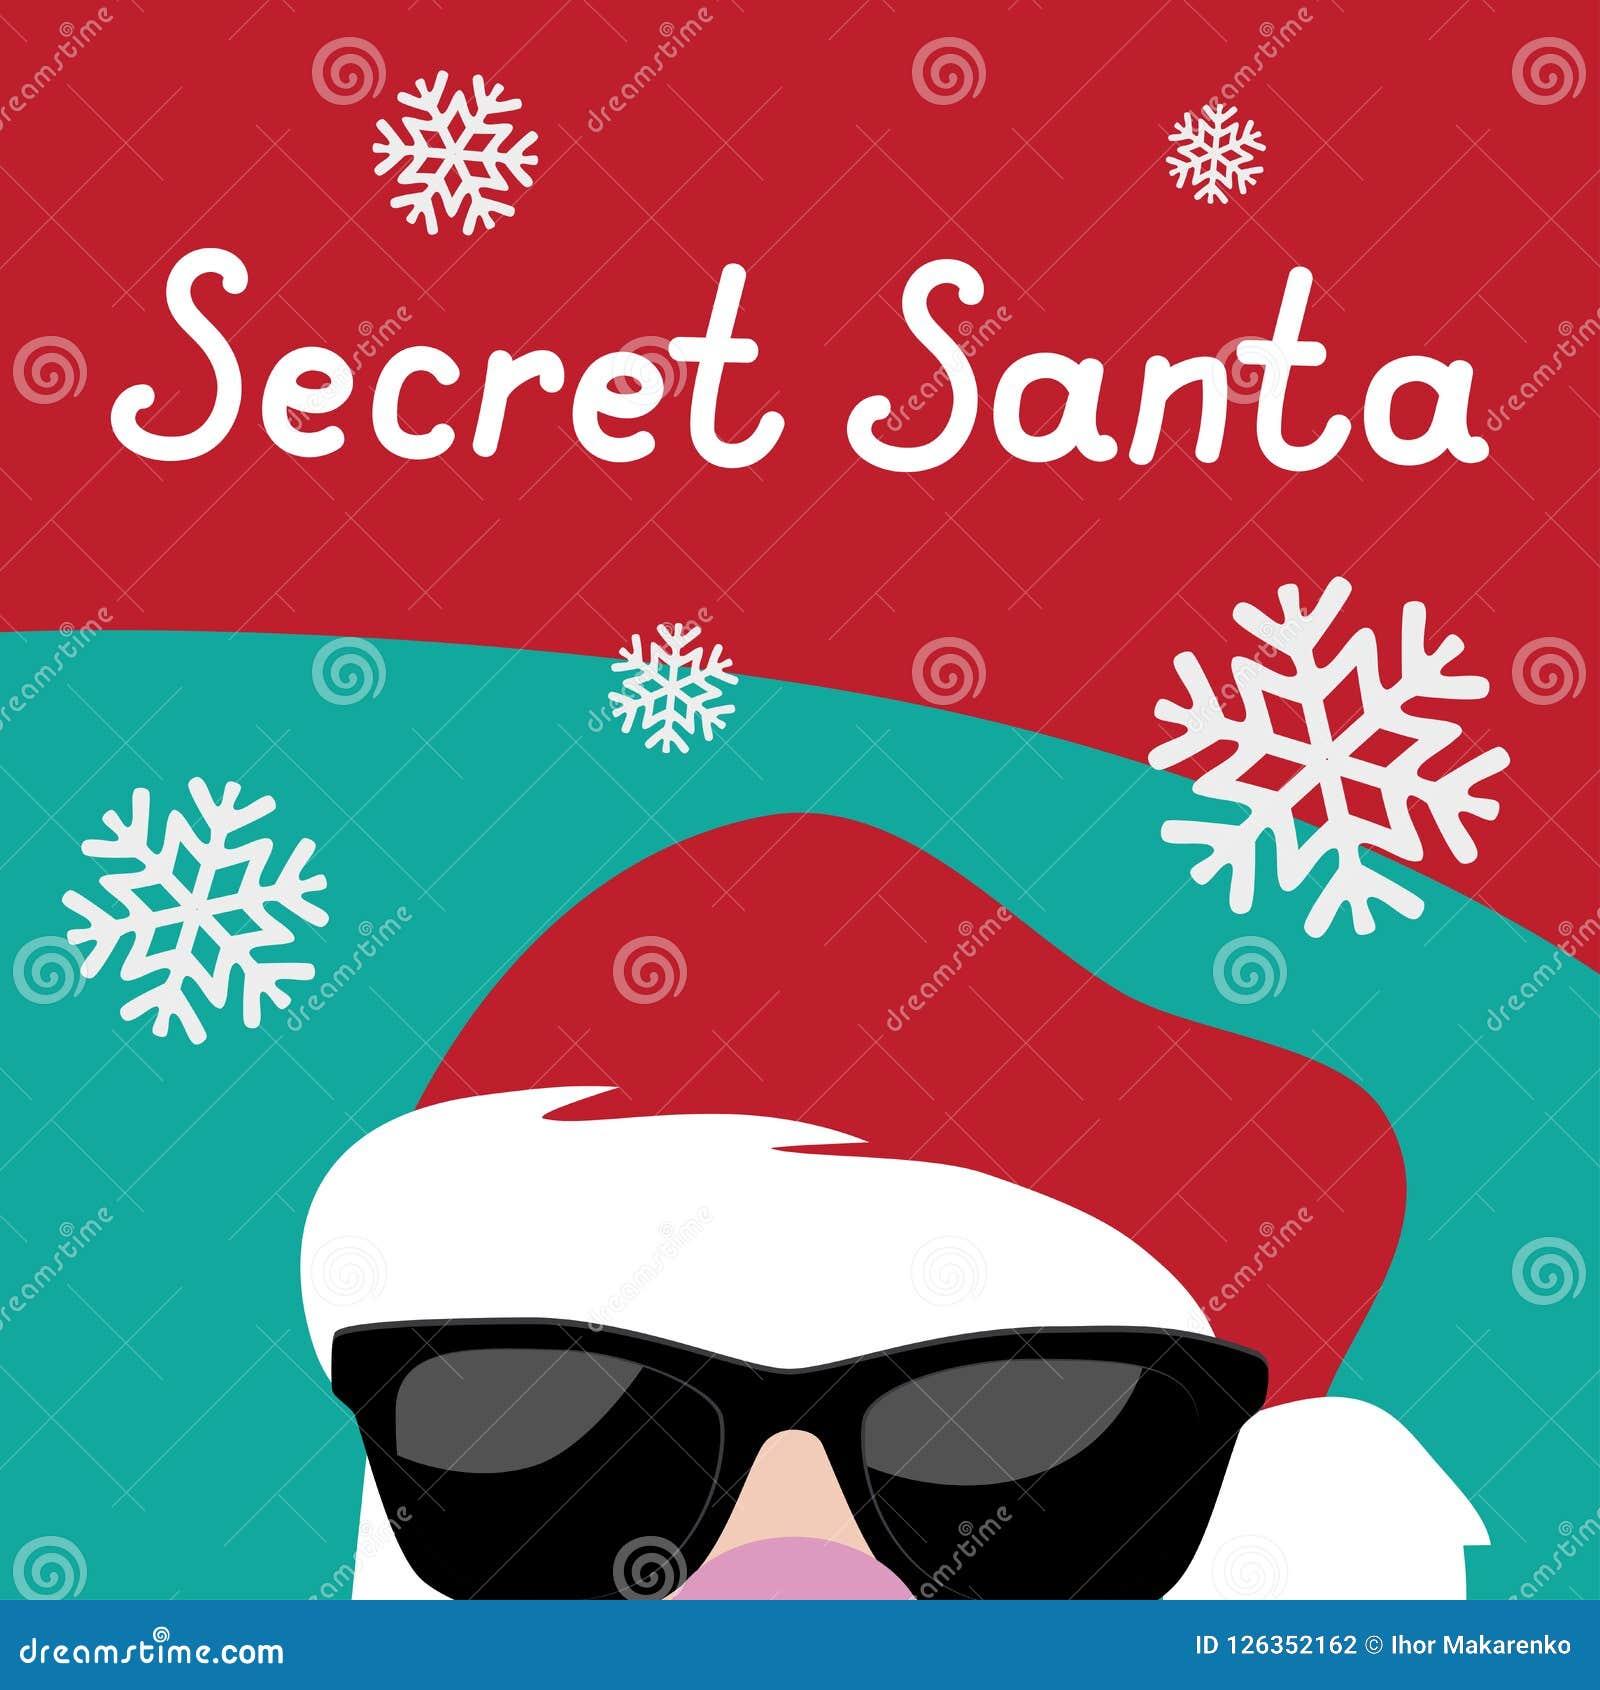 Secret Santa Template Free from thumbs.dreamstime.com